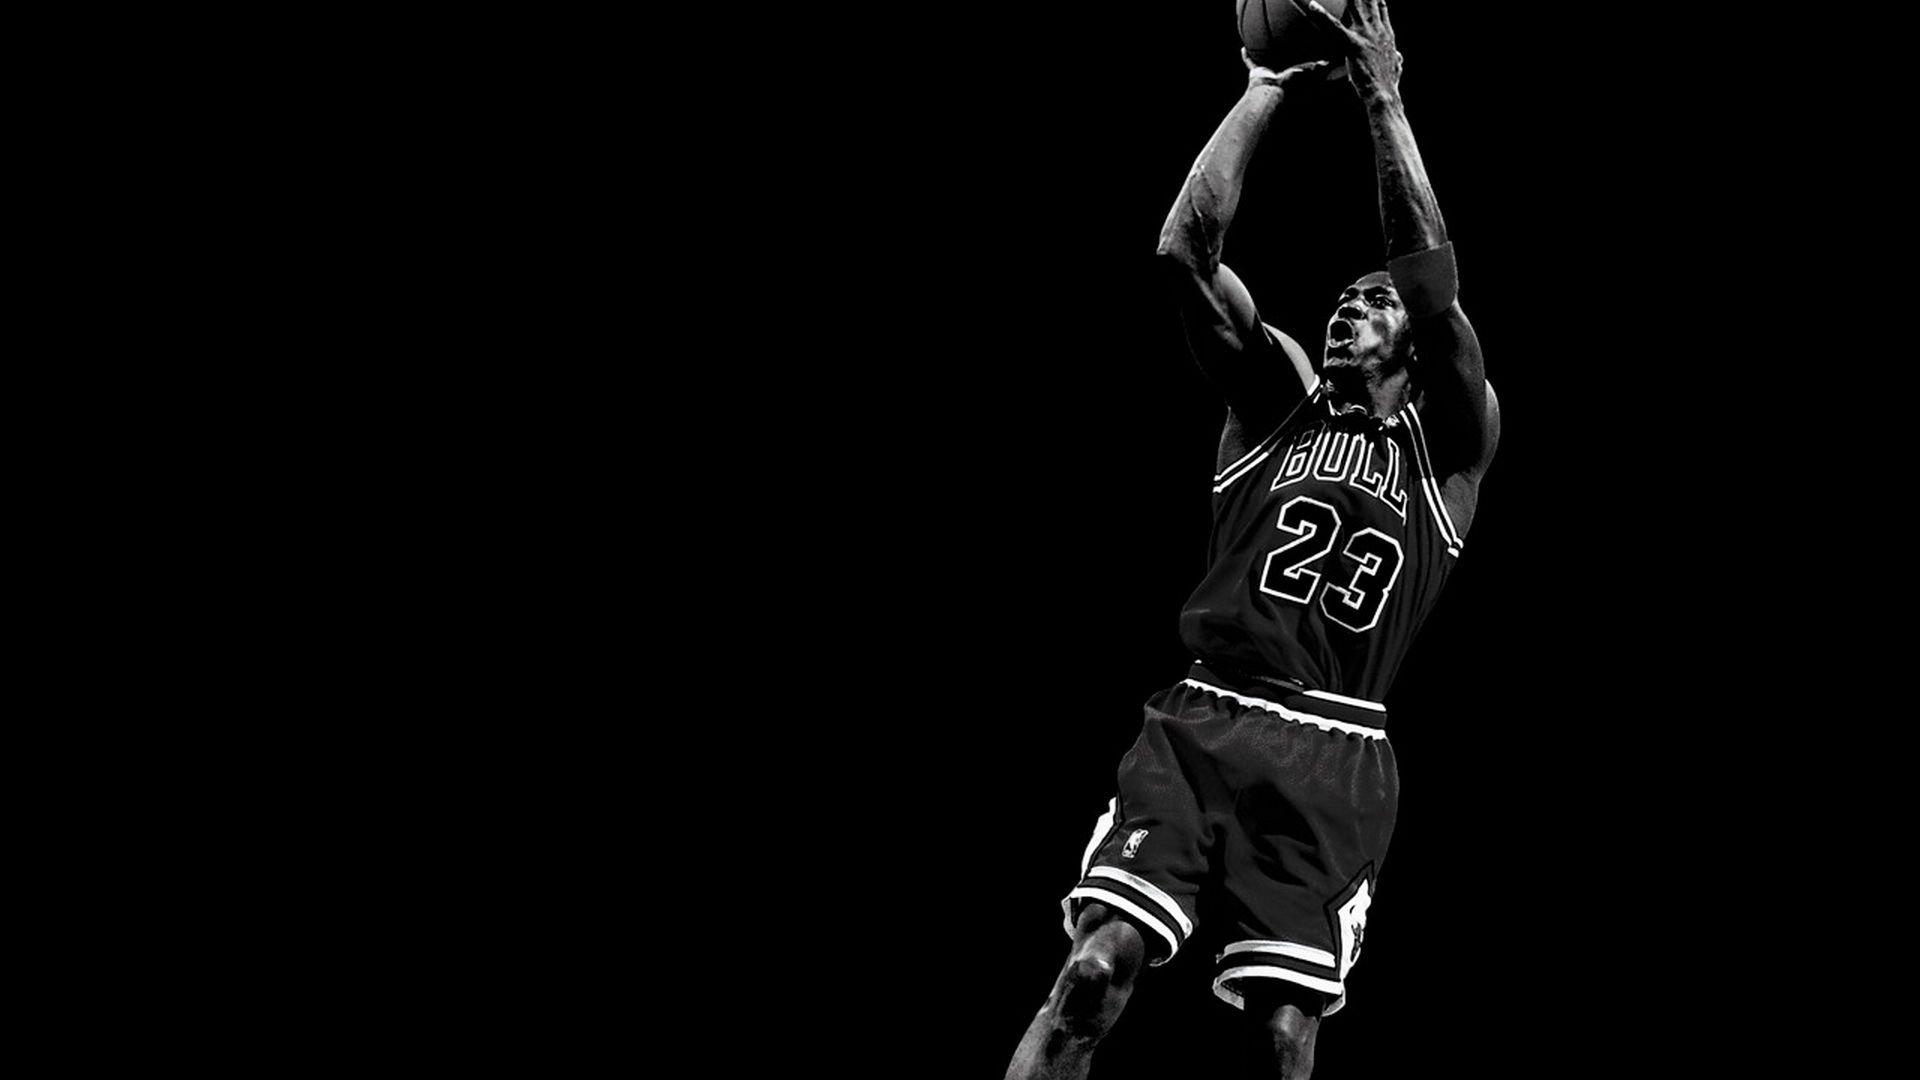 Michael Jordan Computer Black and White Wallpaper High